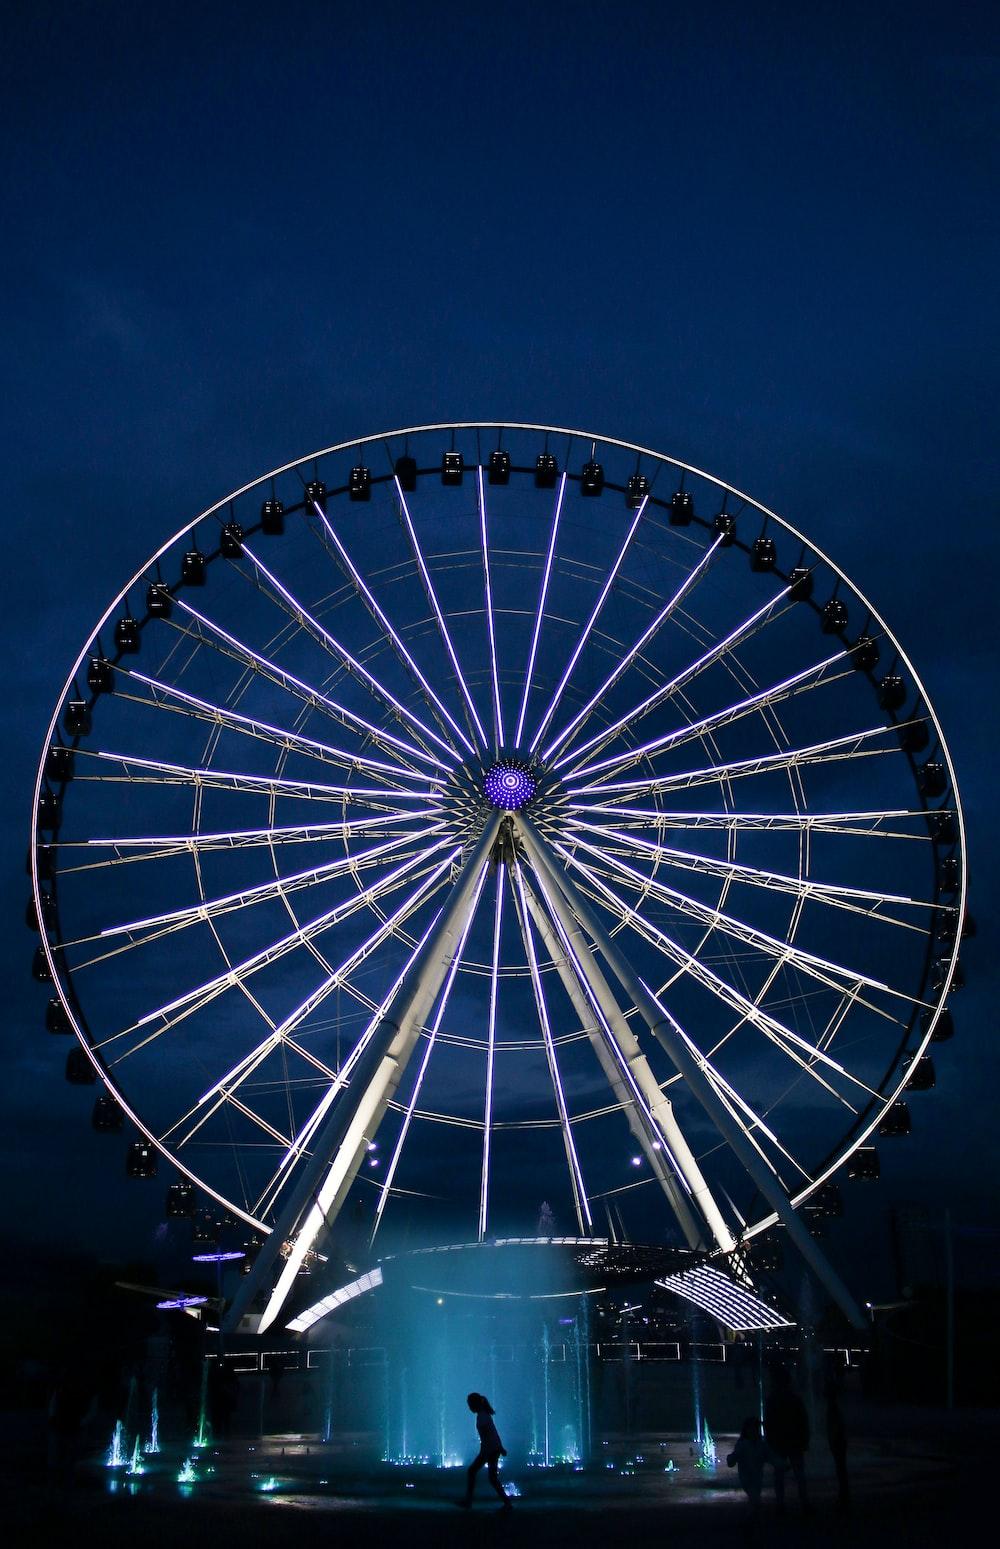 silver ferris wheel during nighttime